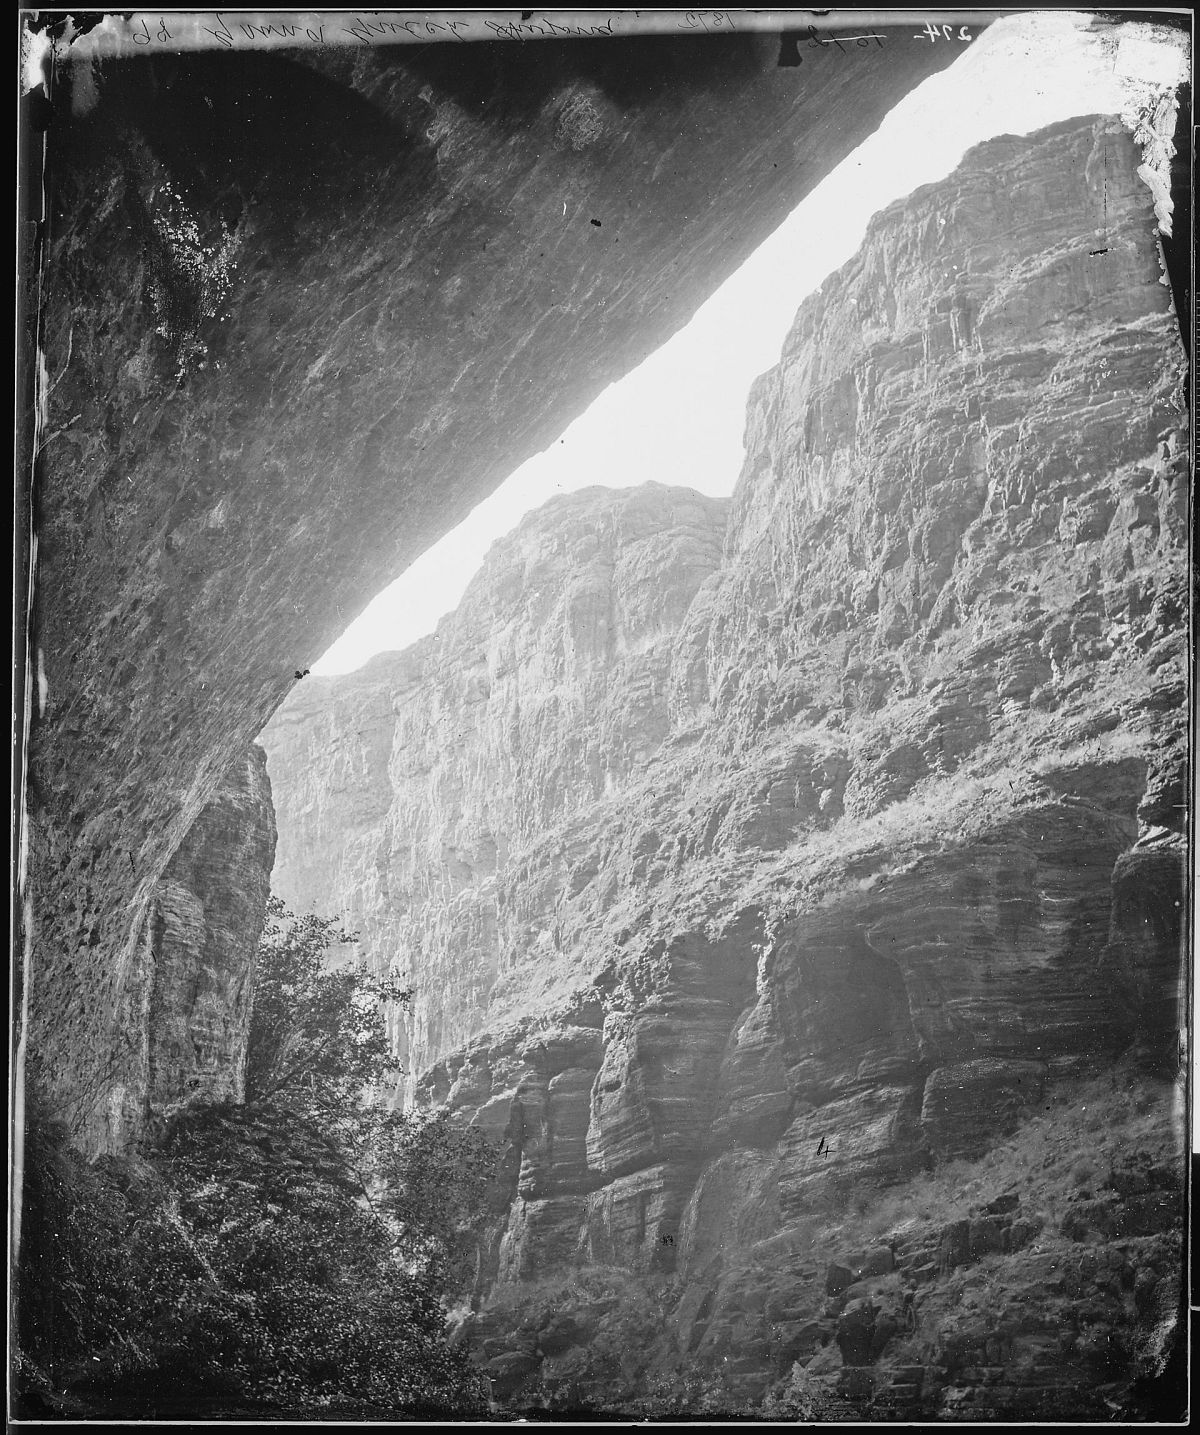 Kanab Canyon in Arizona